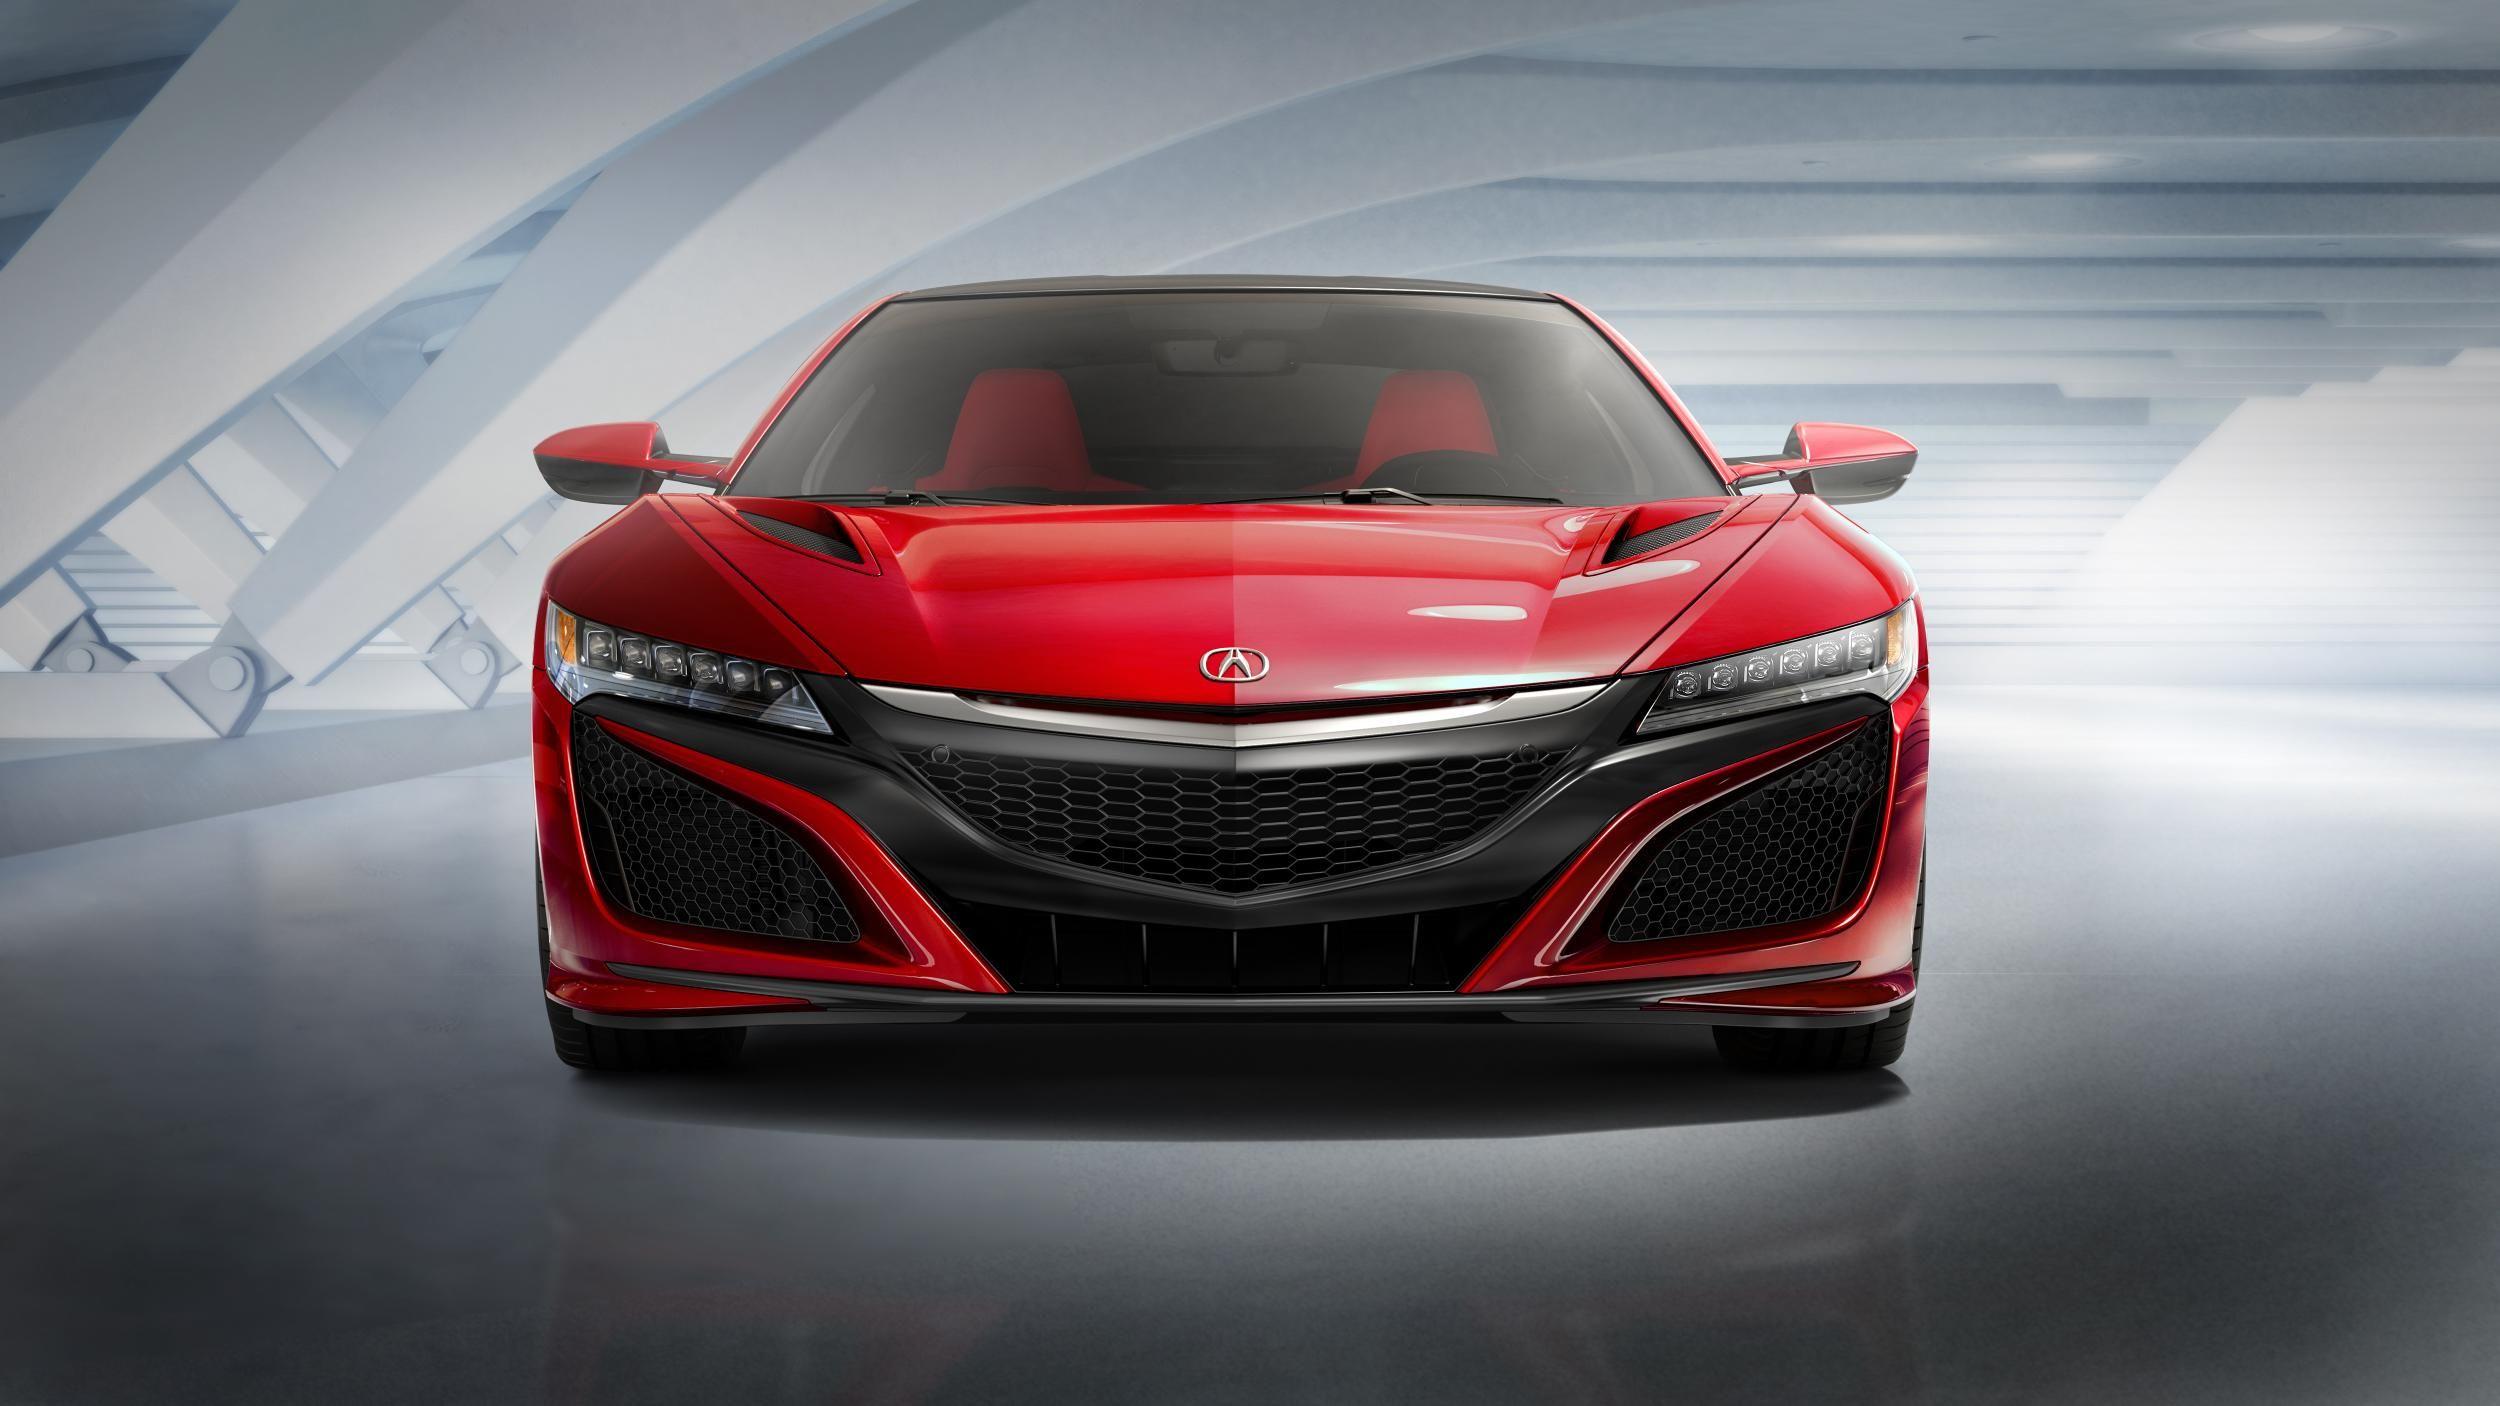 New Honda Nsx Hybrid Supercar Revealed Carhoots Nsx Acura Nsx Honda Nsx 2015